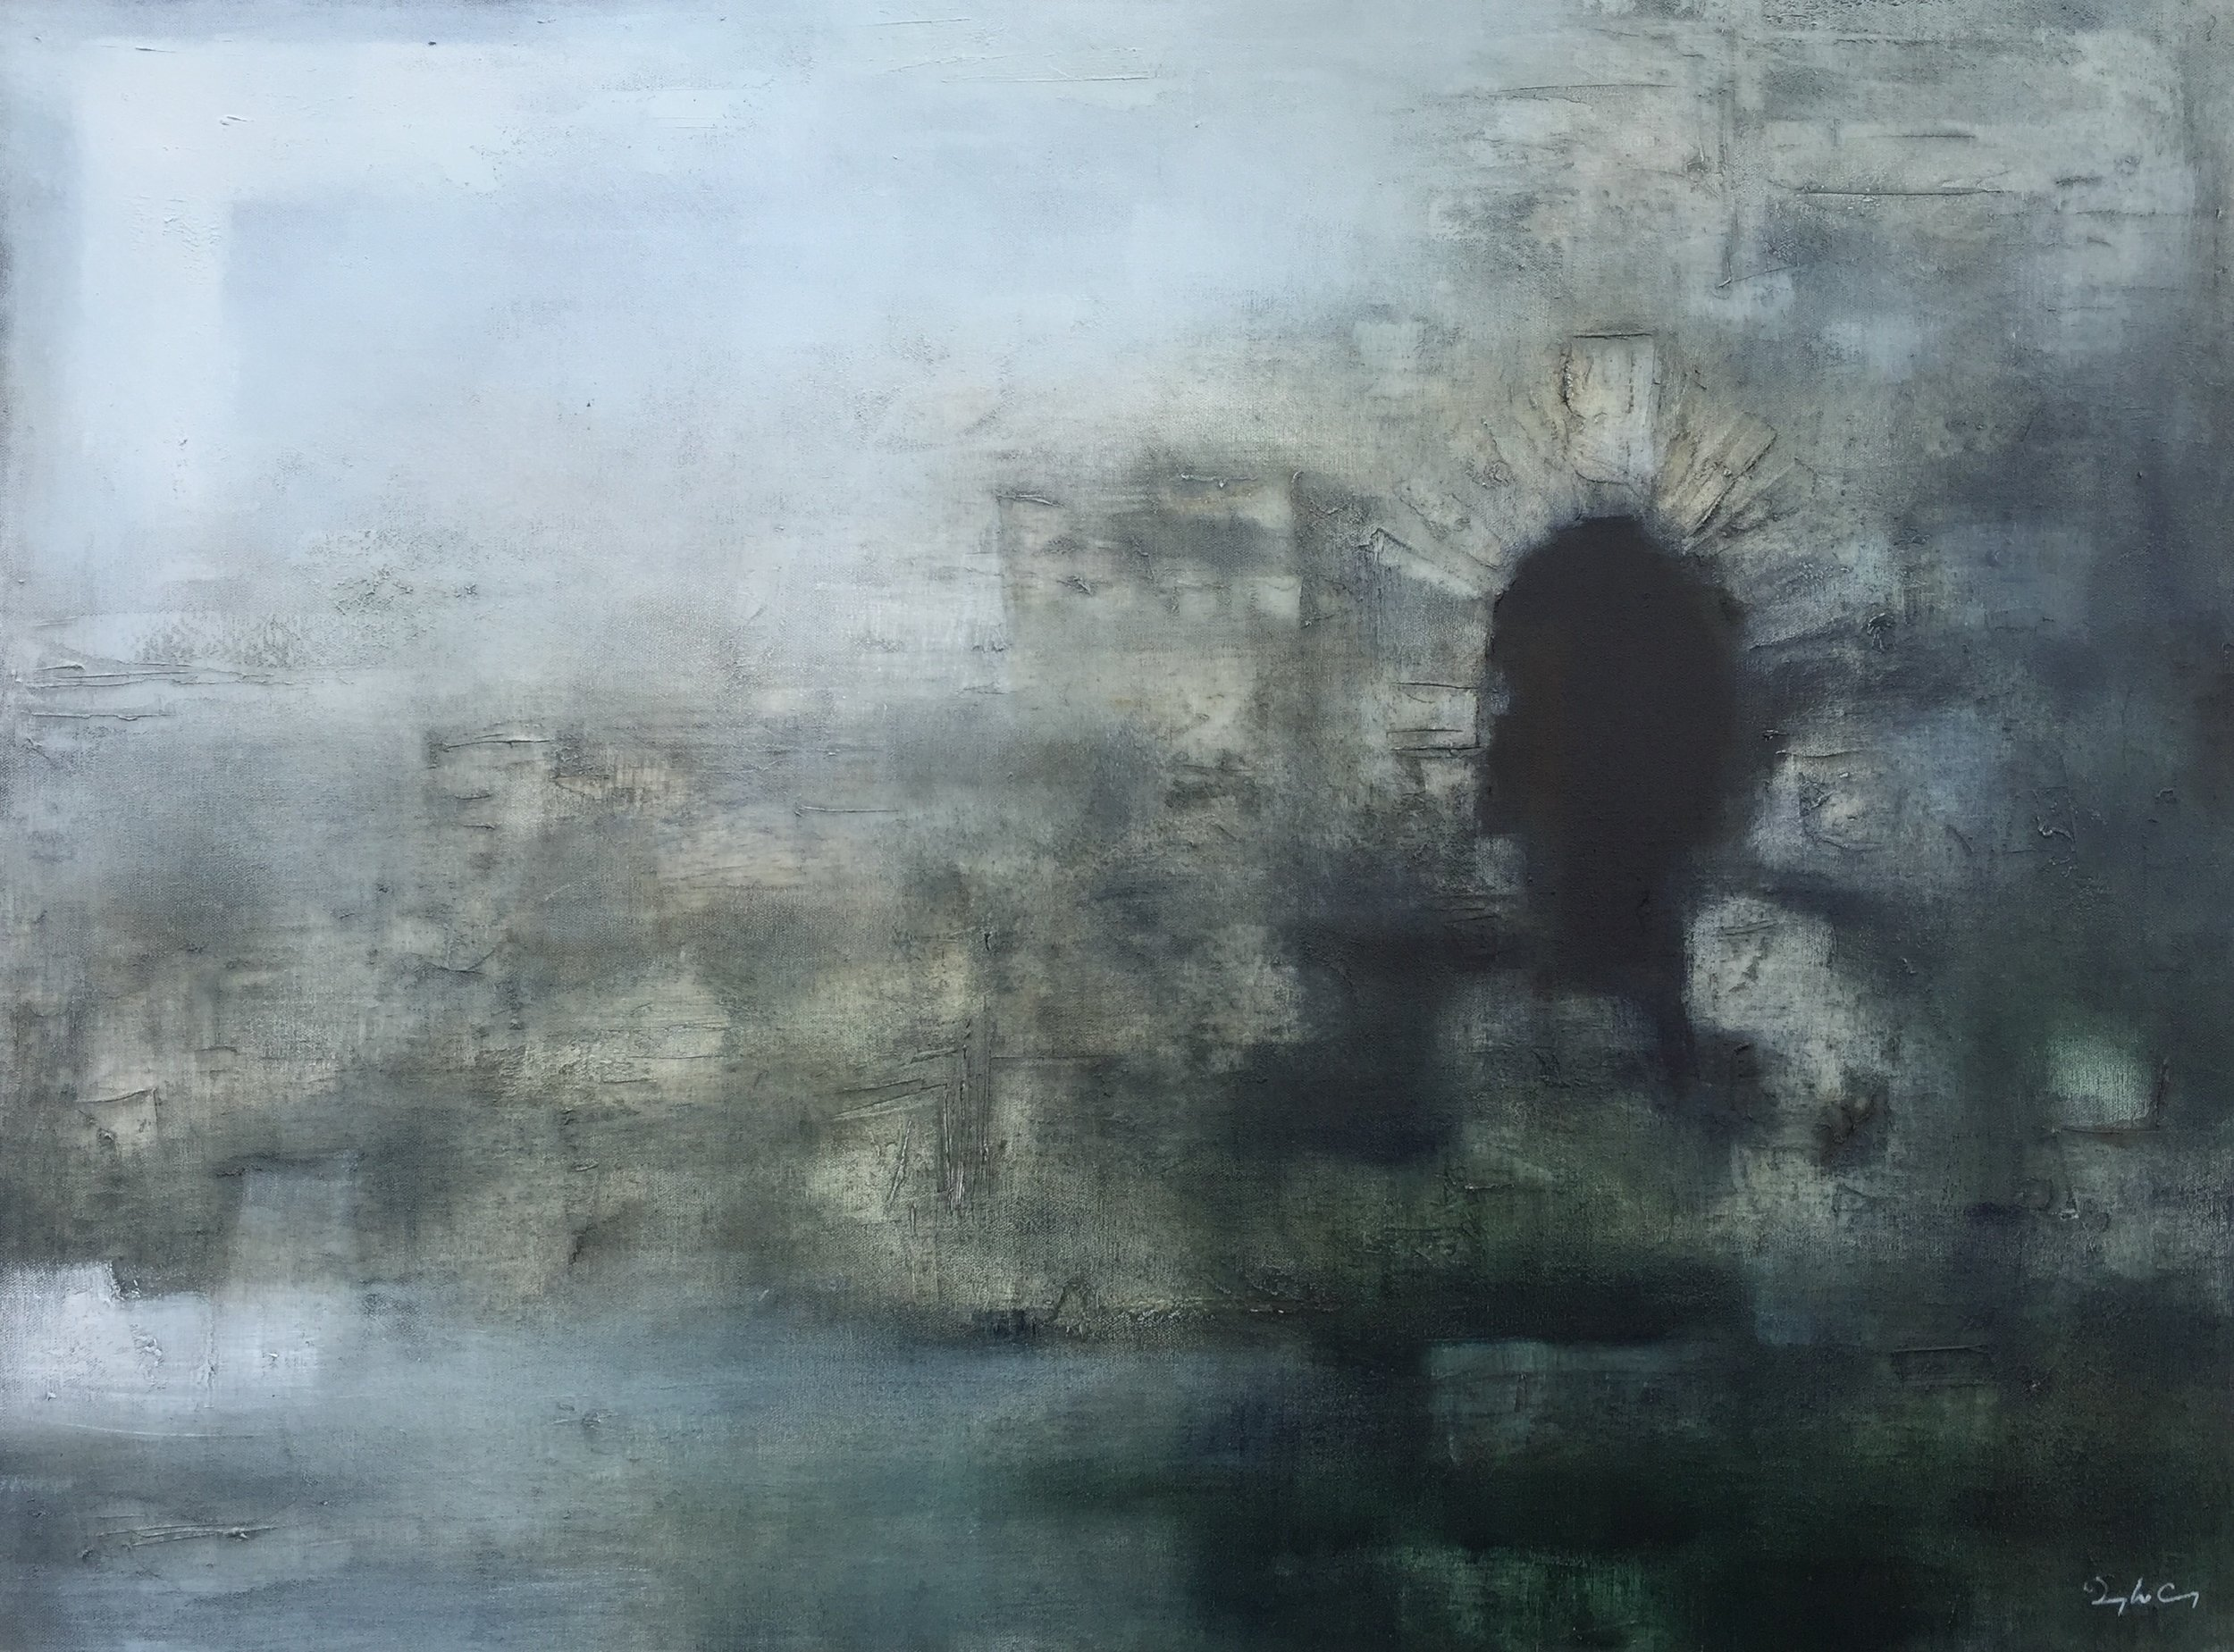 Mural Tower oil on canvas, painting 75cm x 100cm, frame 80cm x 105cm, €2,200